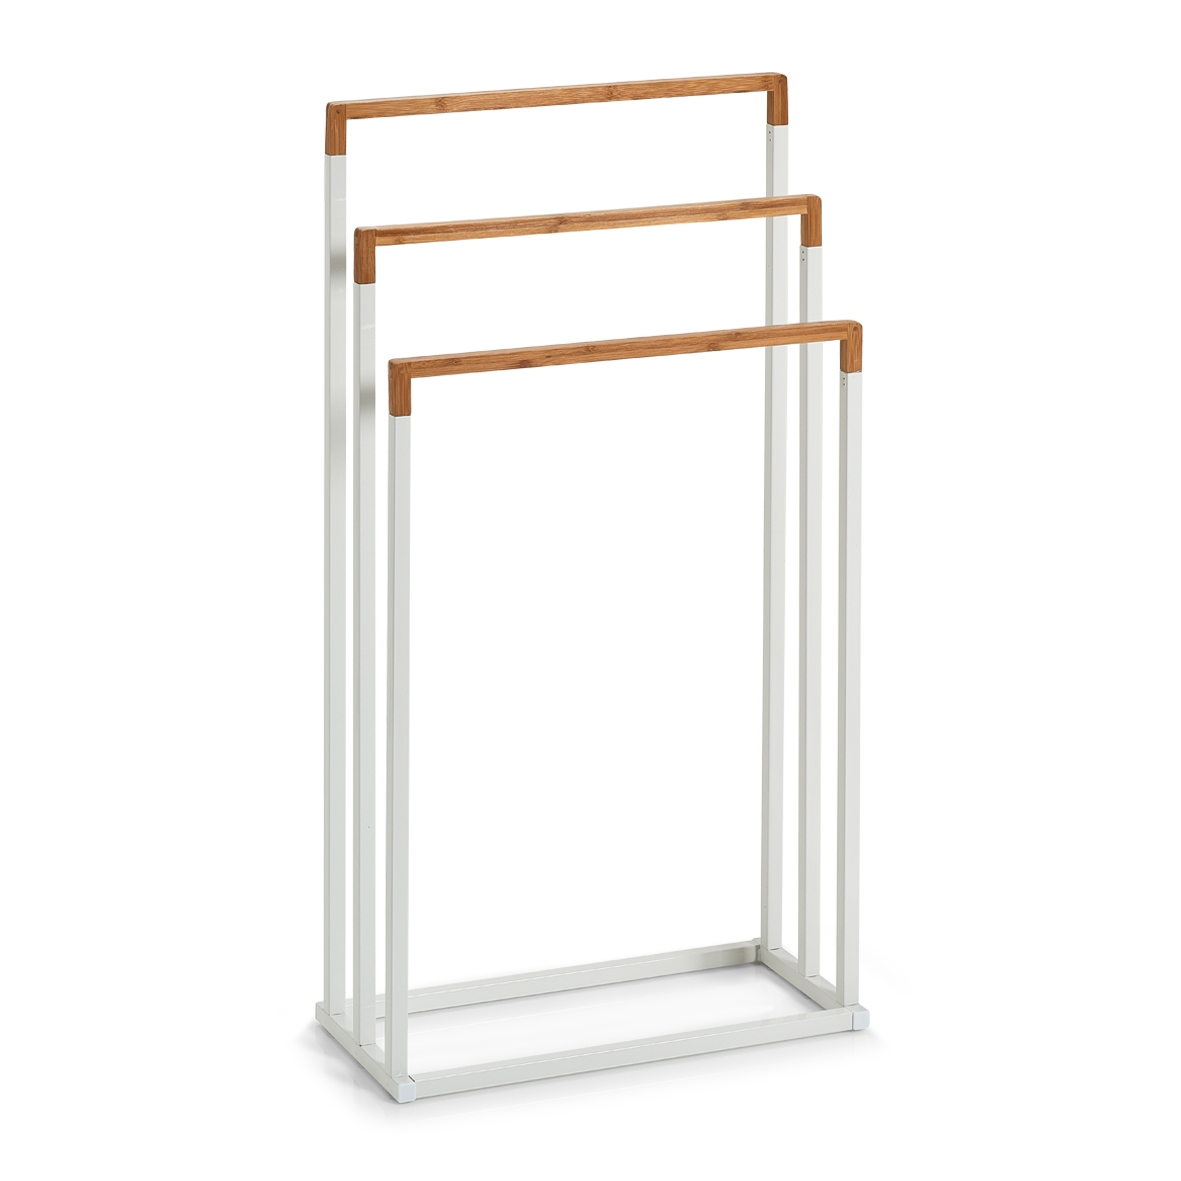 Suport pentru prosoape de baie, Bamboo Metal White, l45xA21,5xH84,5 cm